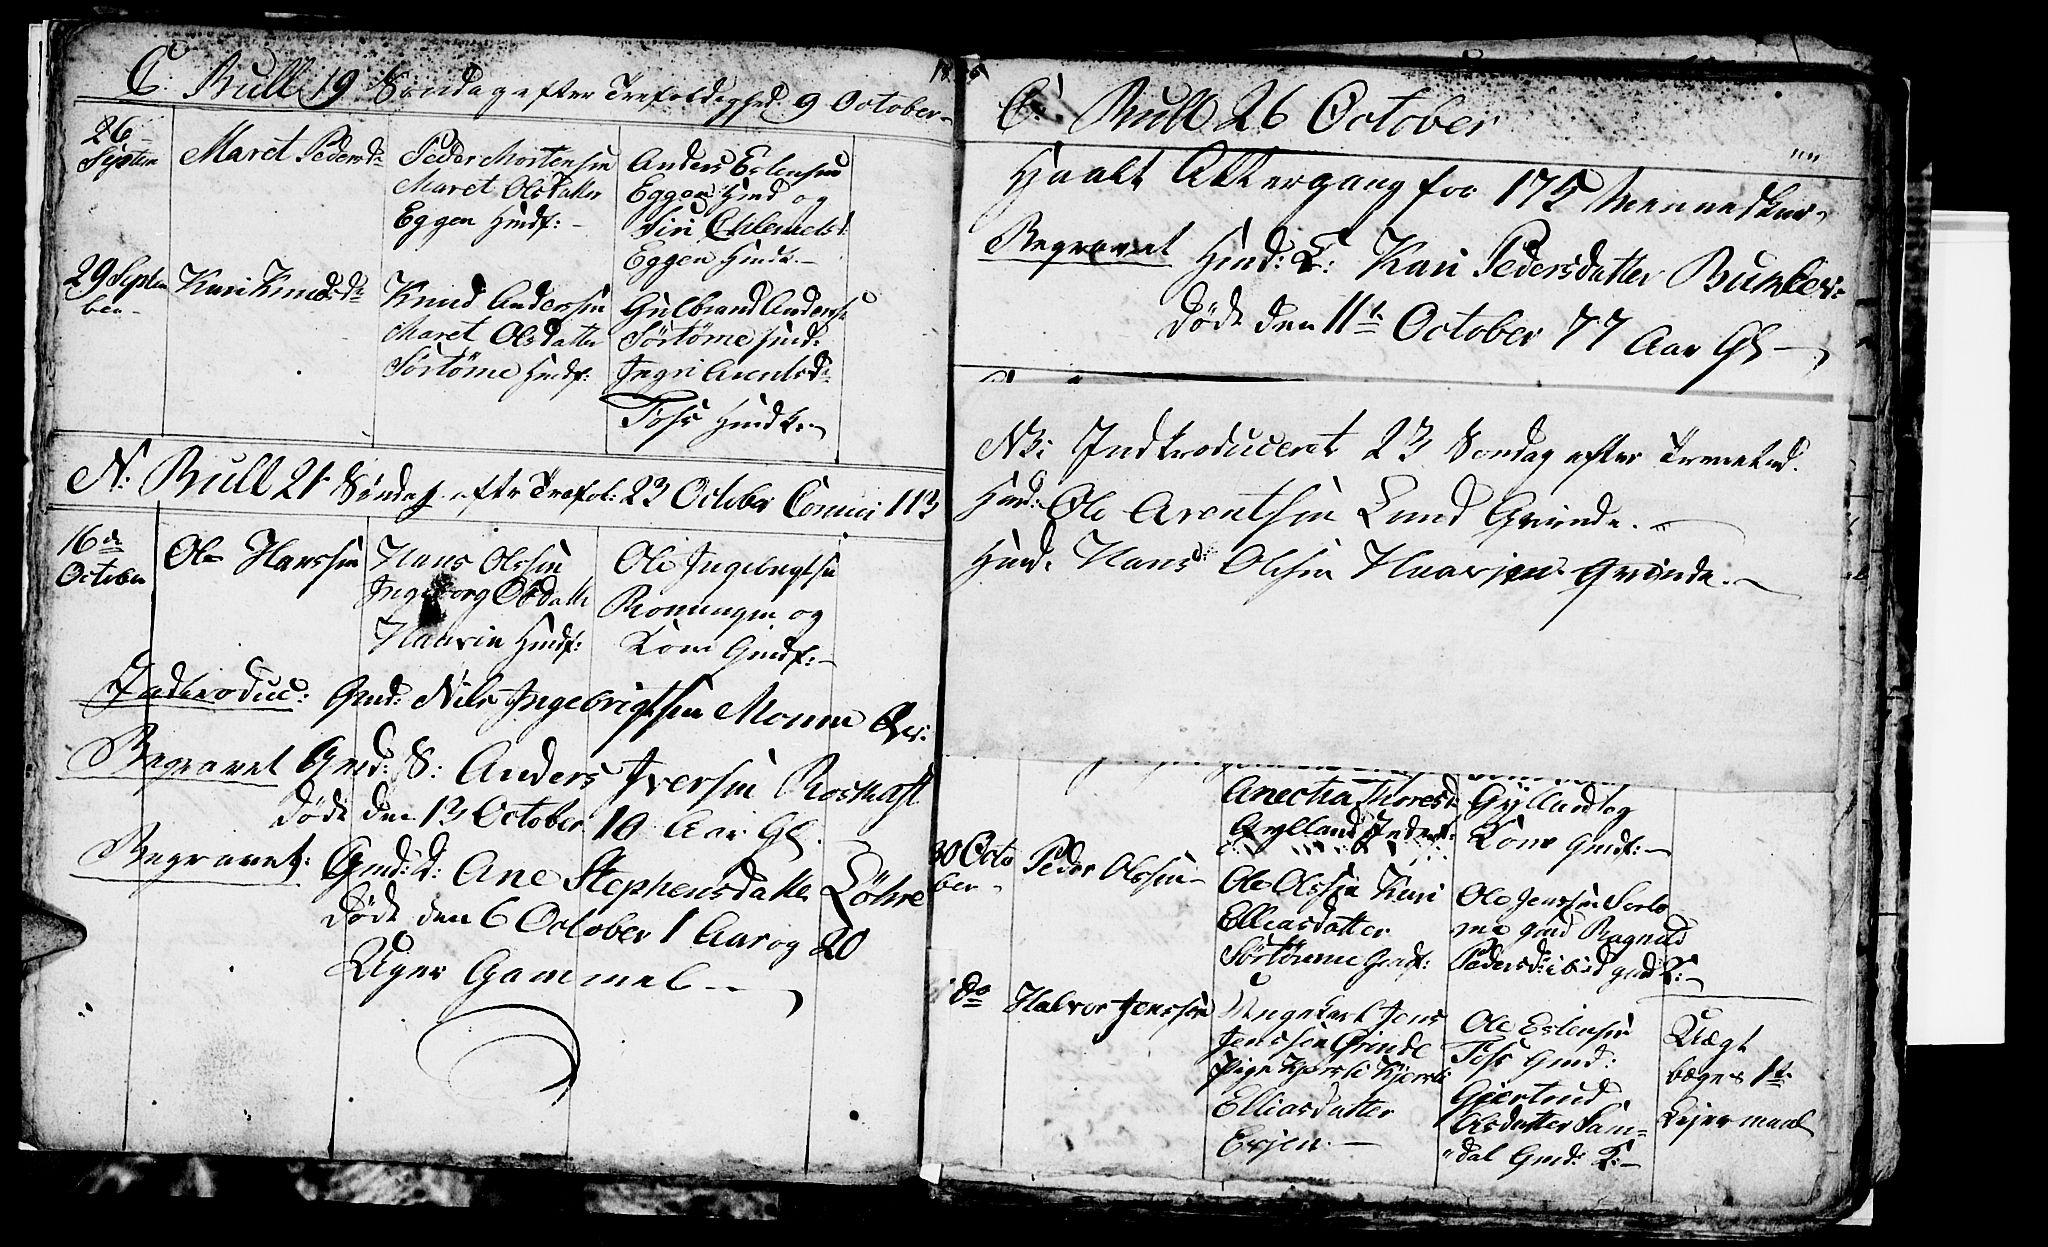 SAT, Ministerialprotokoller, klokkerbøker og fødselsregistre - Sør-Trøndelag, 692/L1109: Parish register (copy) no. 692C04, 1825-1827